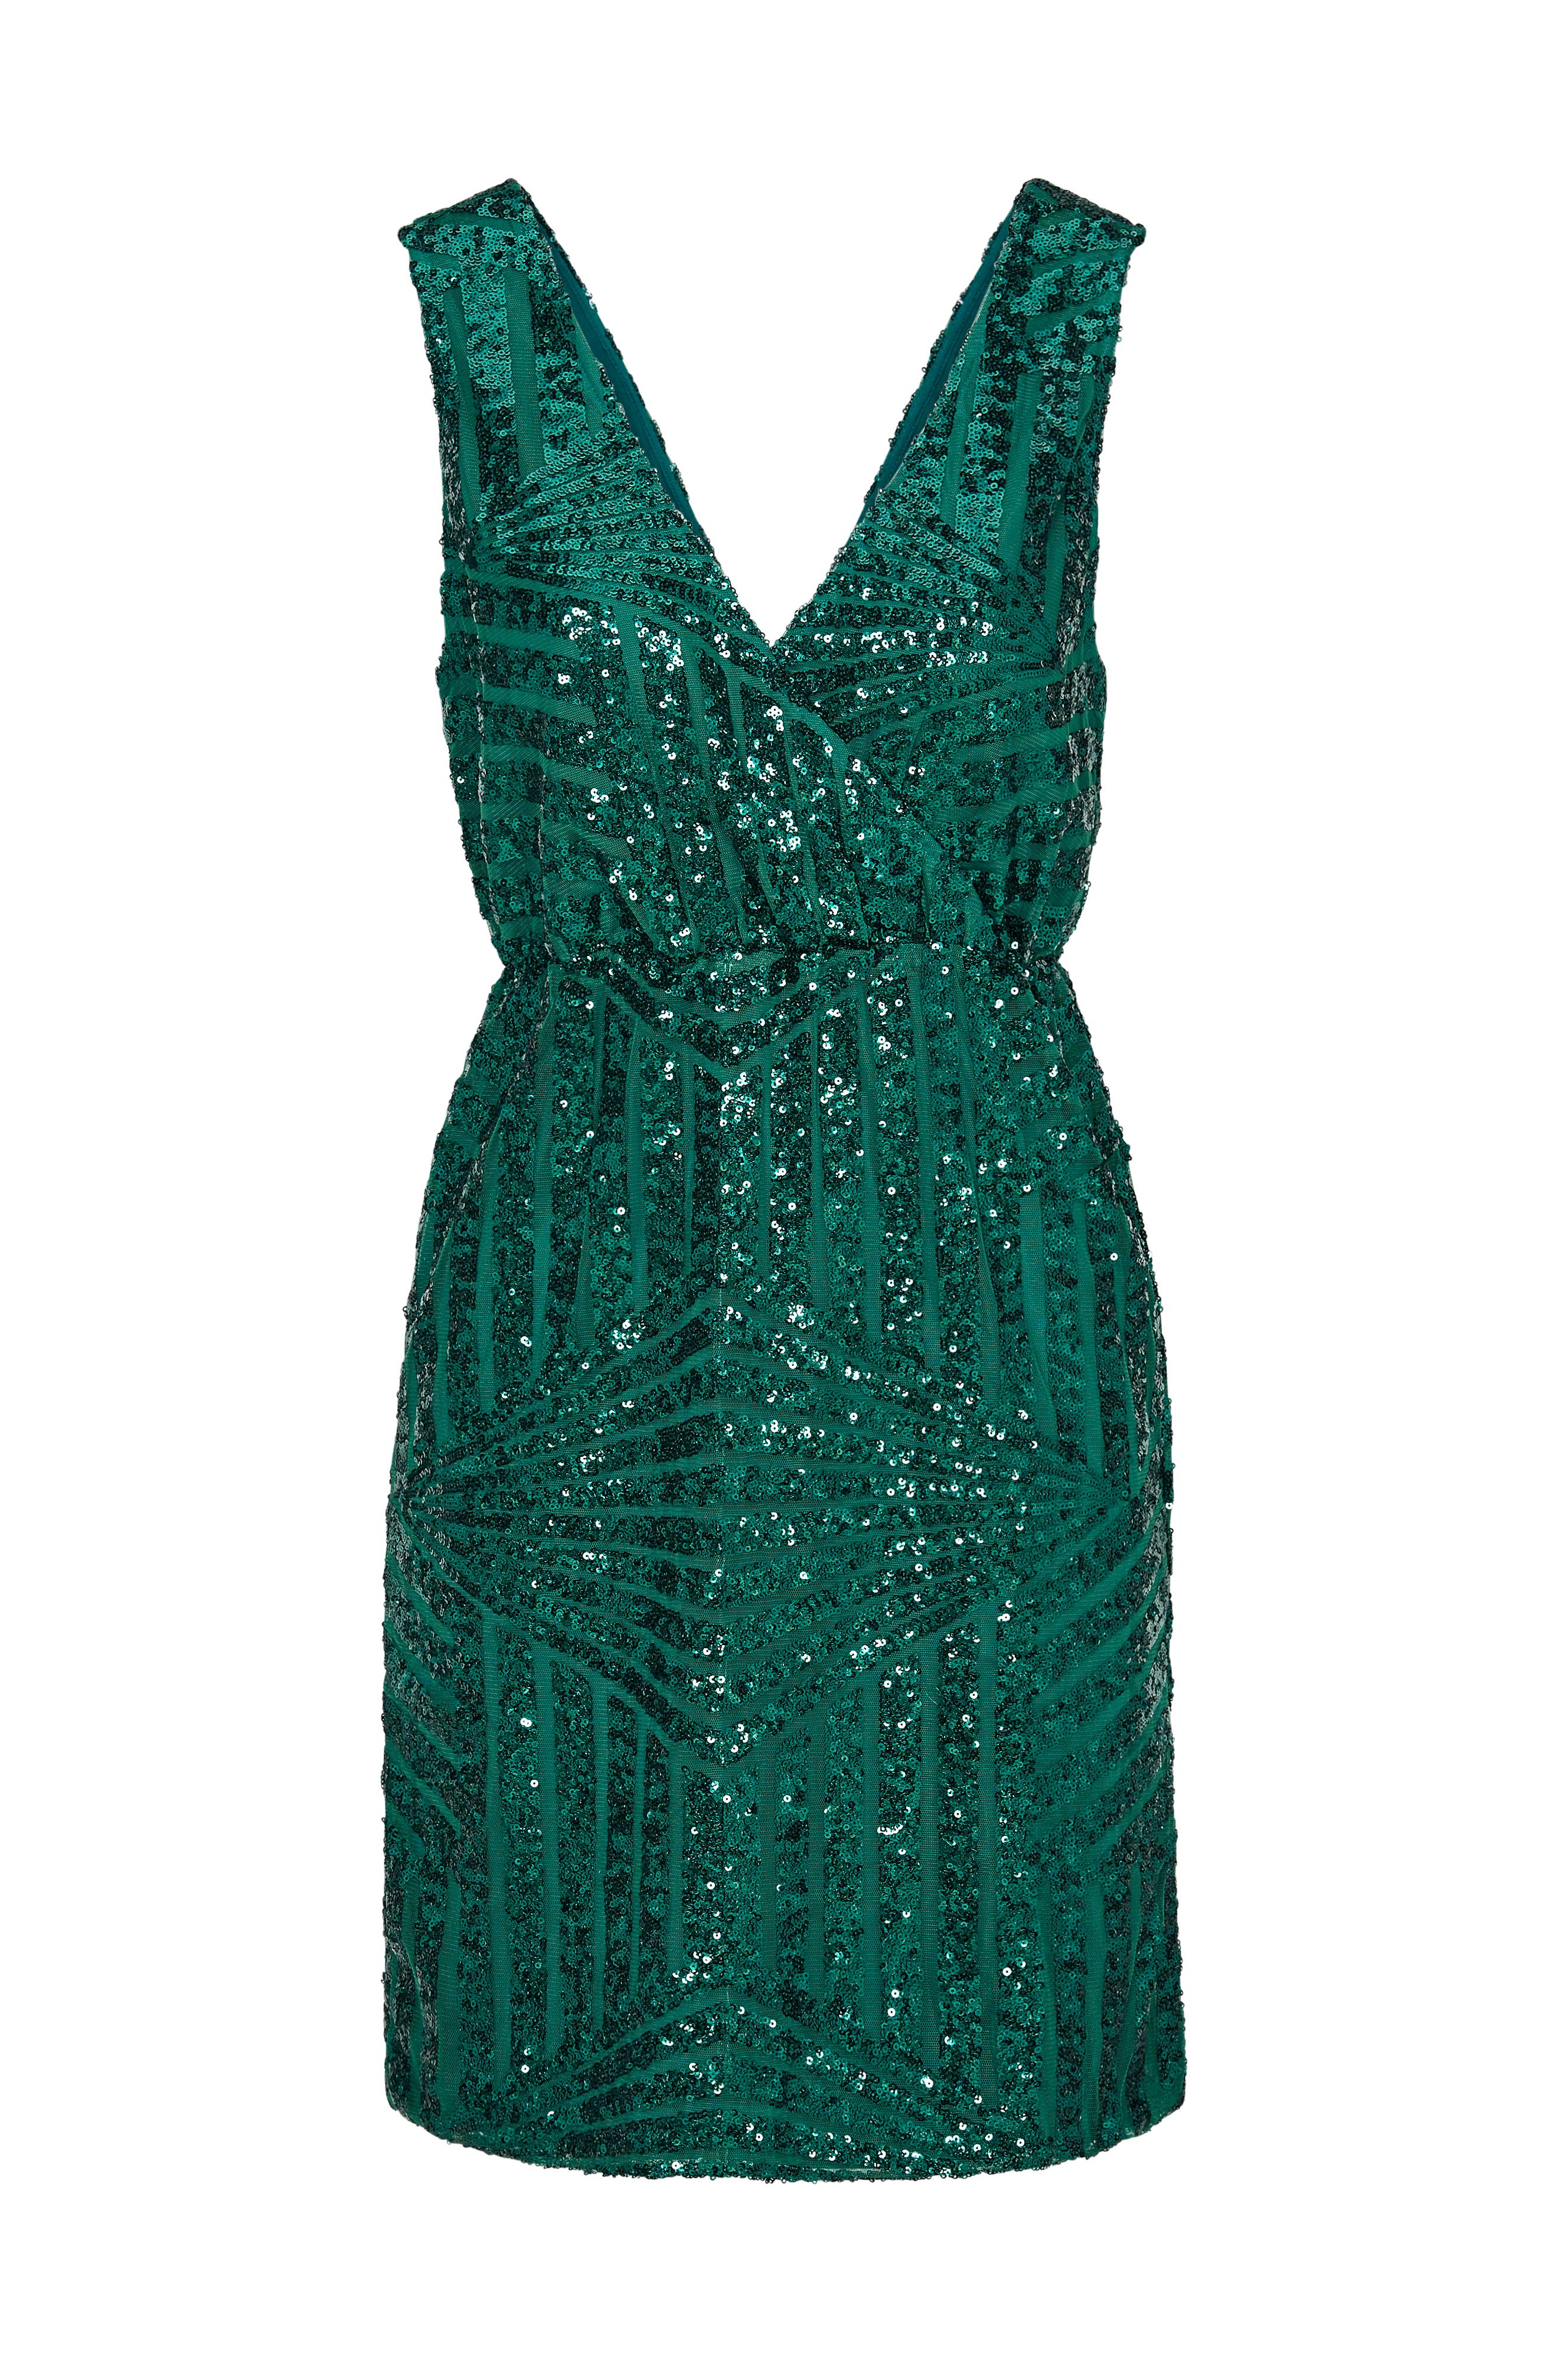 73fd2325 Dame Dame Dame Grønn Dress Dress Dress Vila no Ellos Paljettkjole viMikka  SL tIBxwqXW4x